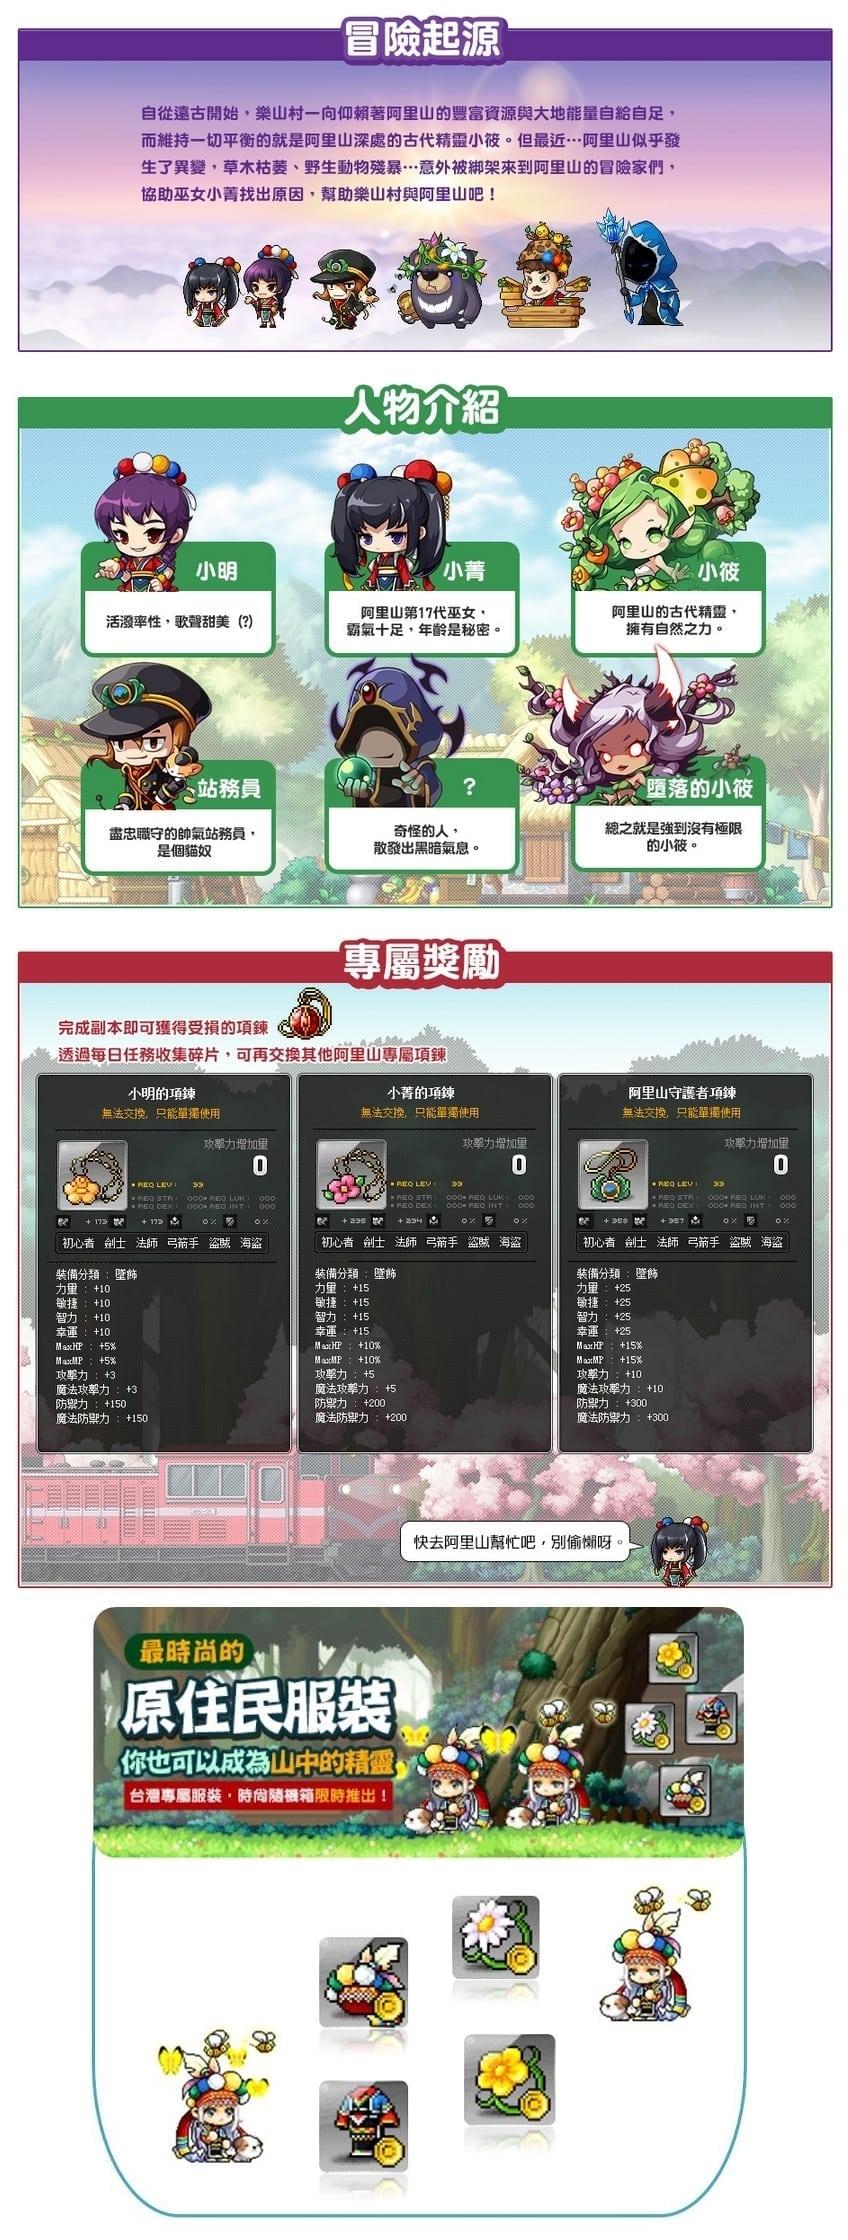 MapleStory Taiwan - Alishan details